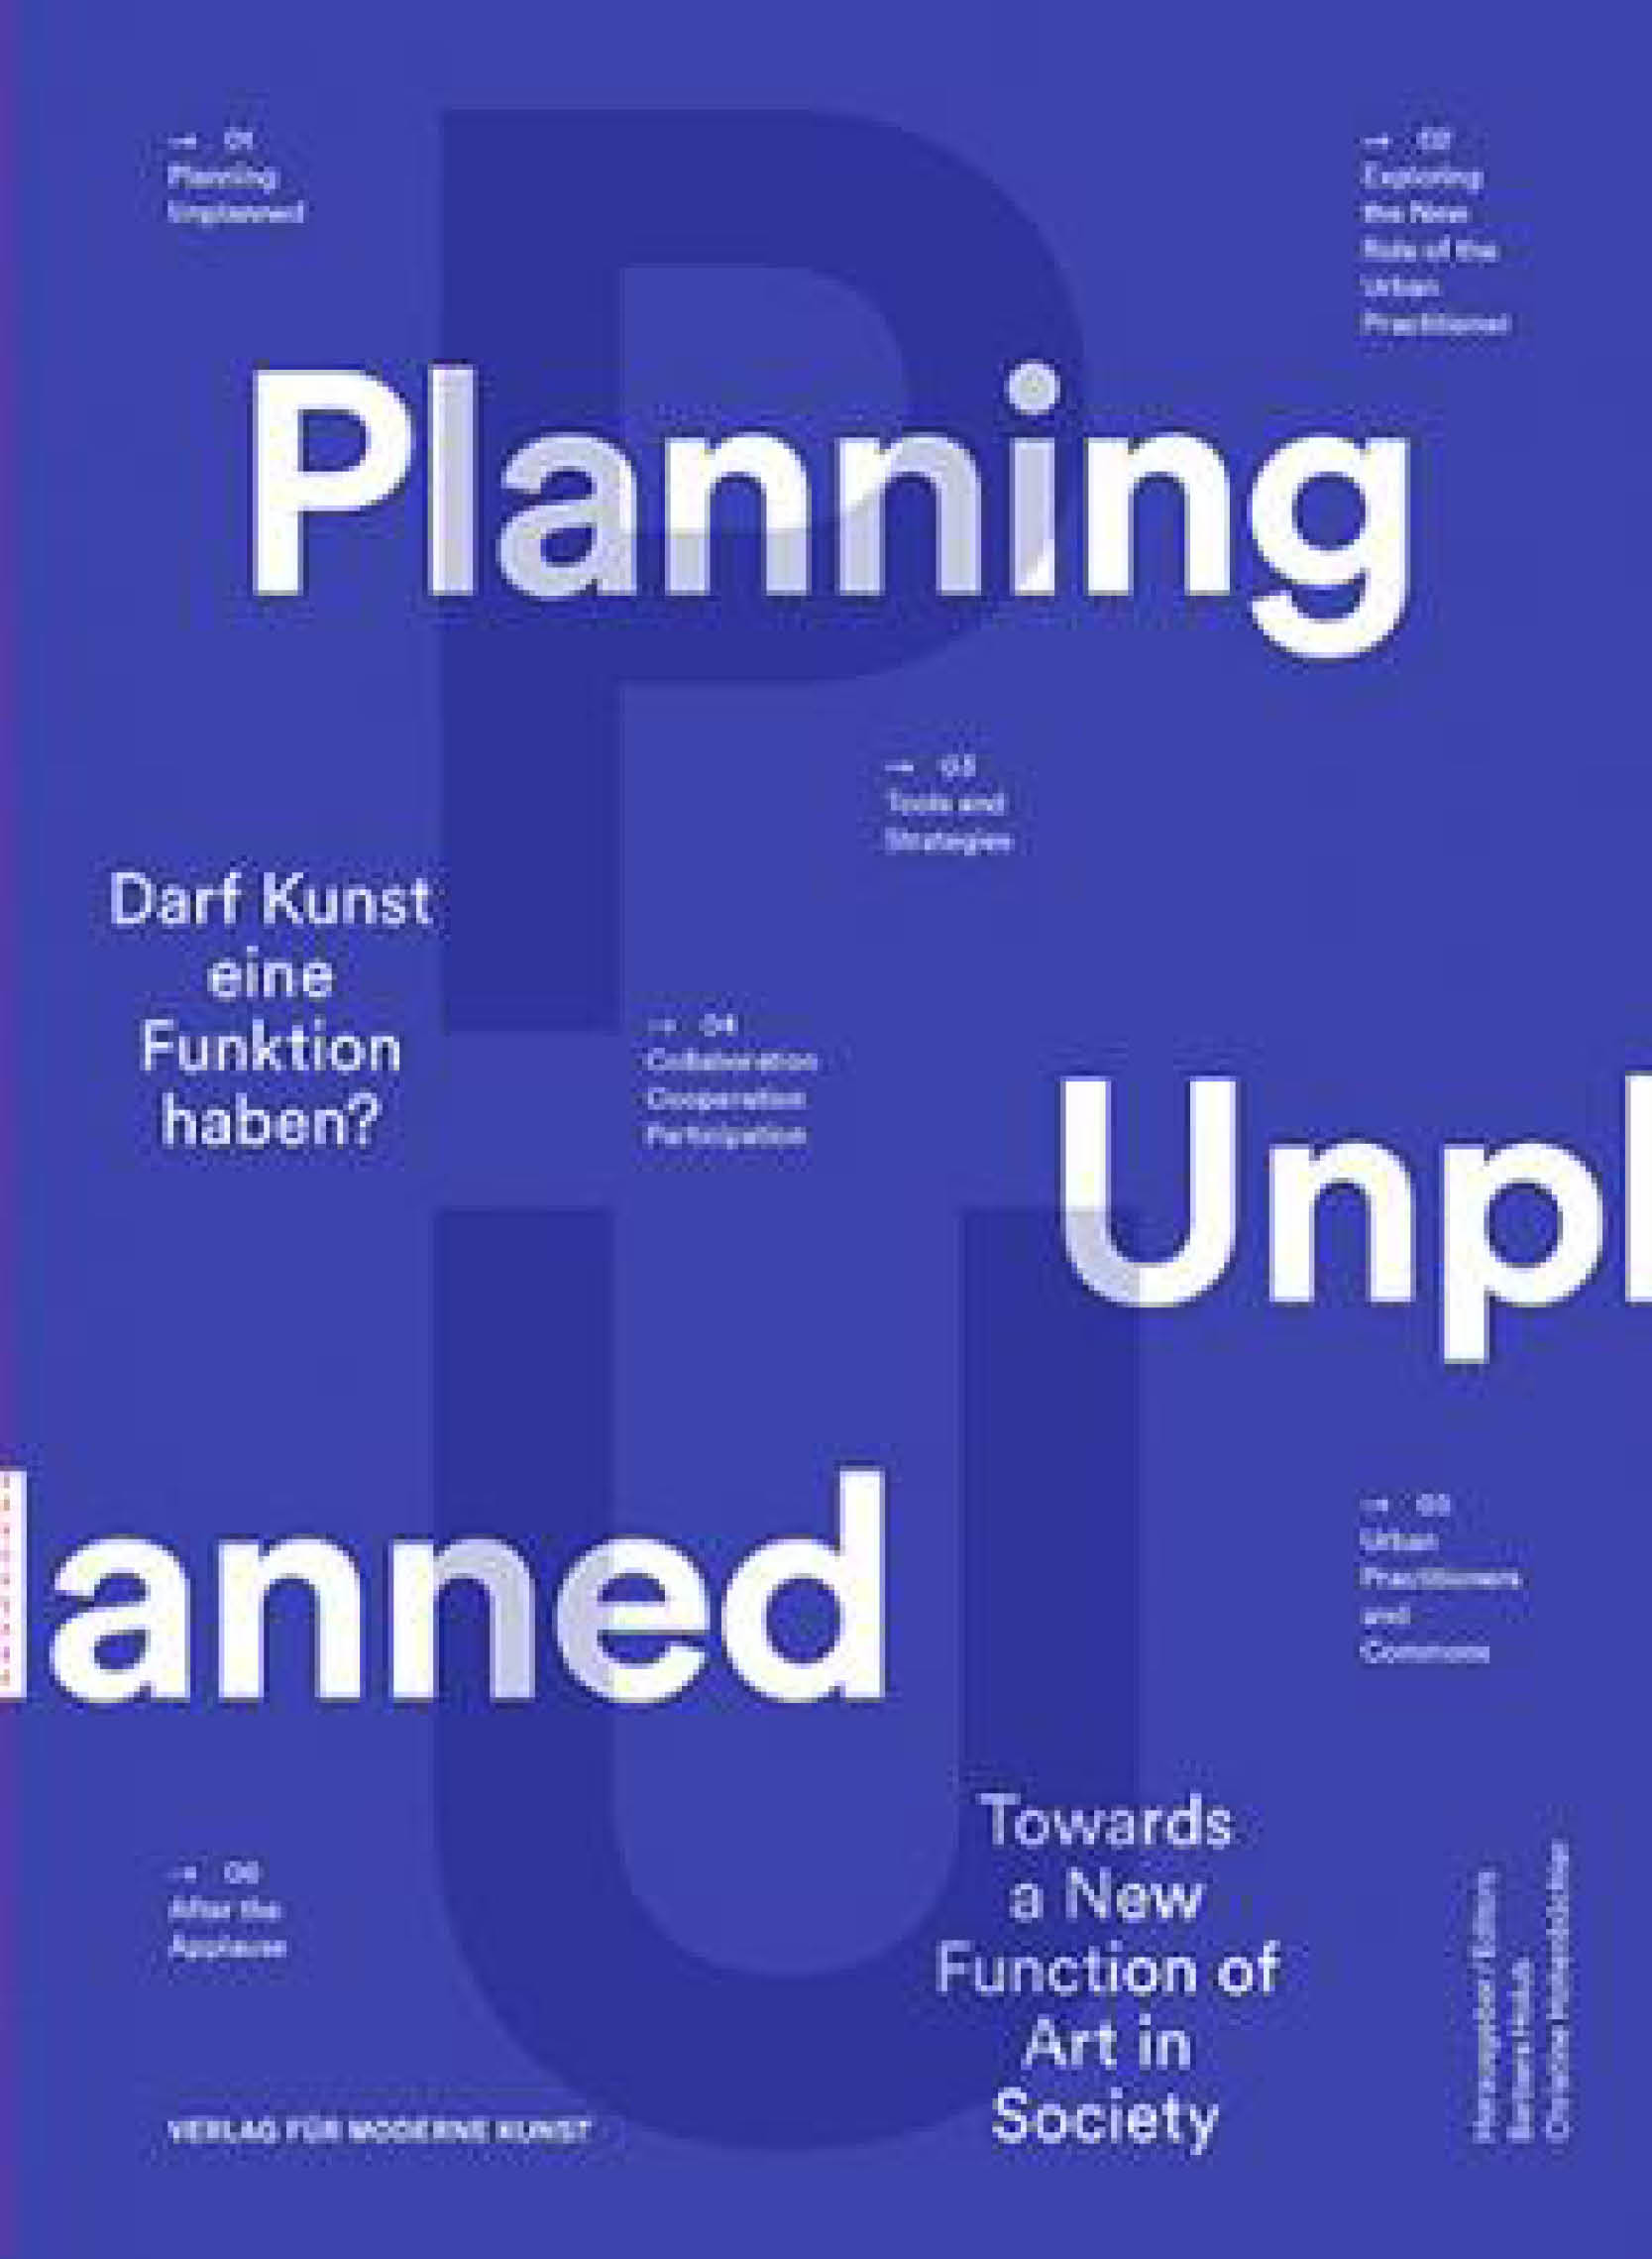 Planning Unplanned - Darf Kunst eine Funktion haben? Towards a New Function of Art in Society, 2015